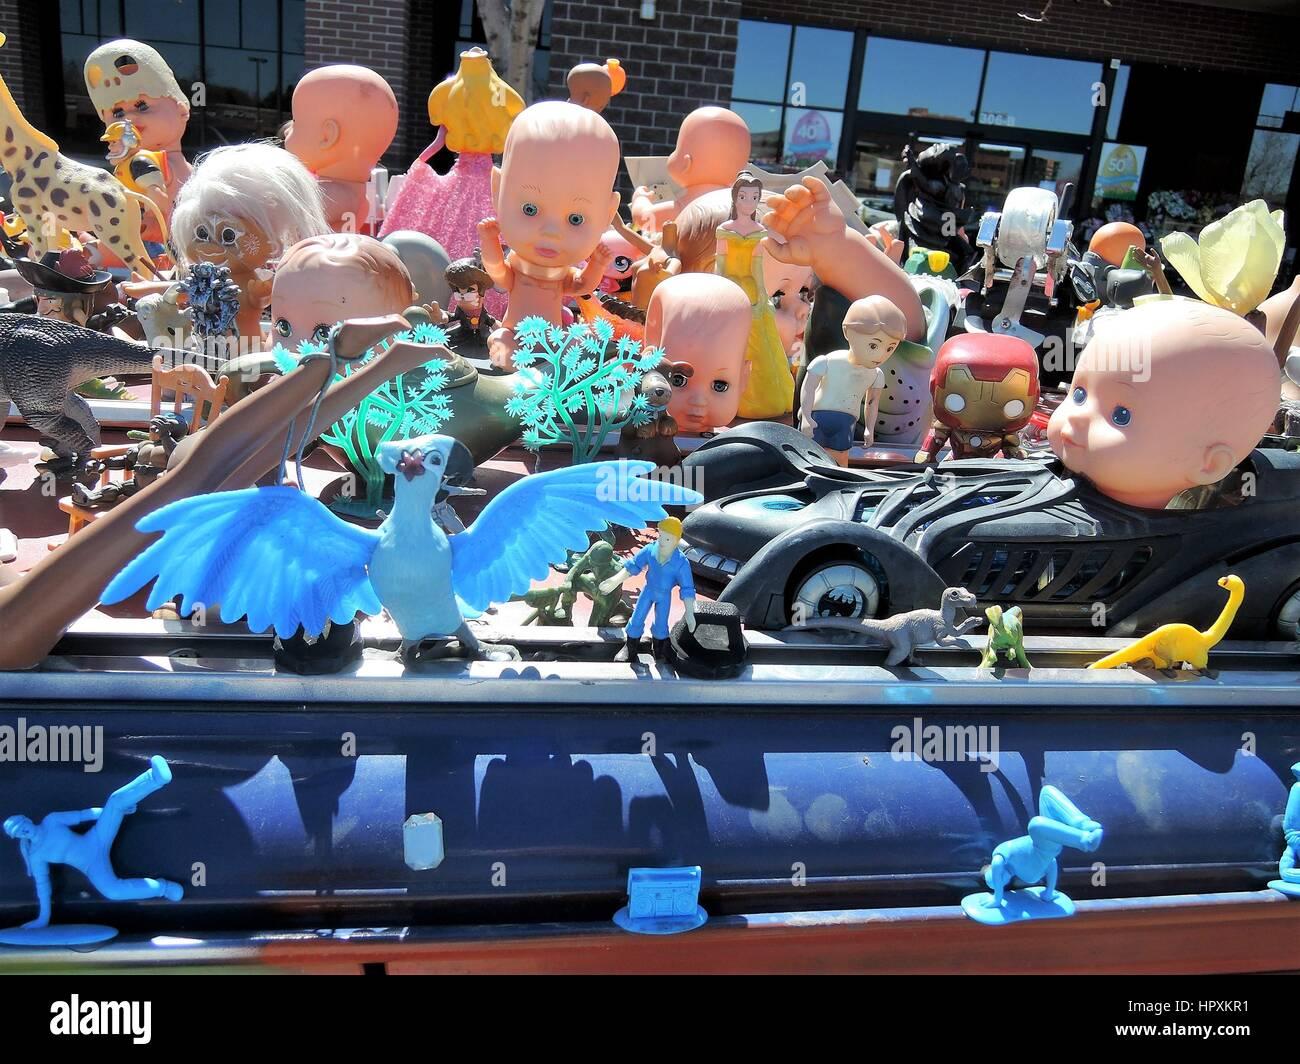 Weird Car Decorations - Stock Image